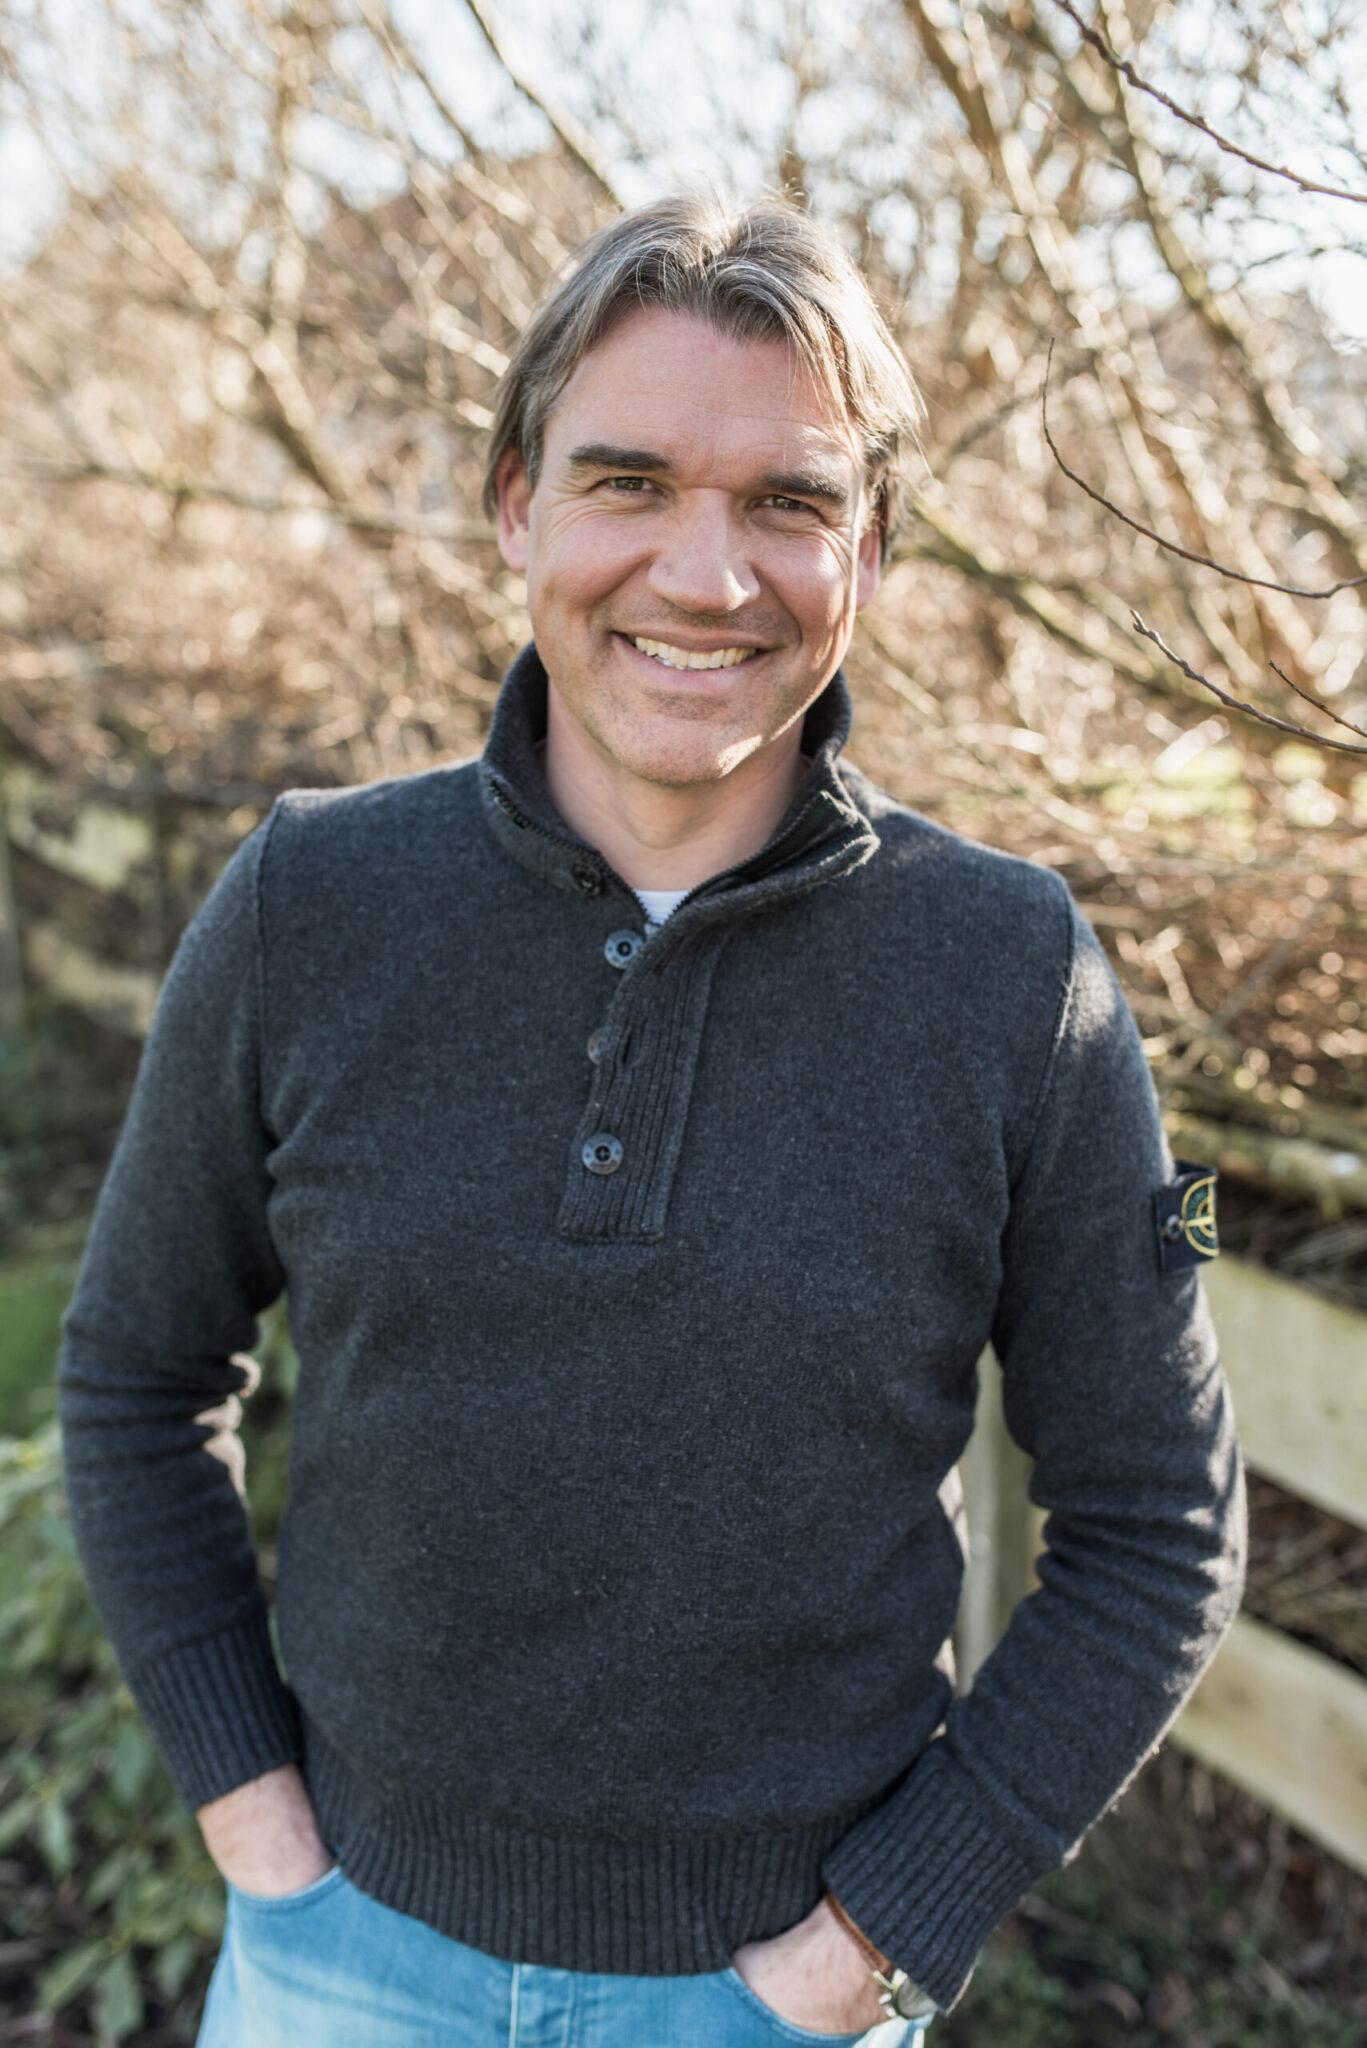 Clemens Schuurs